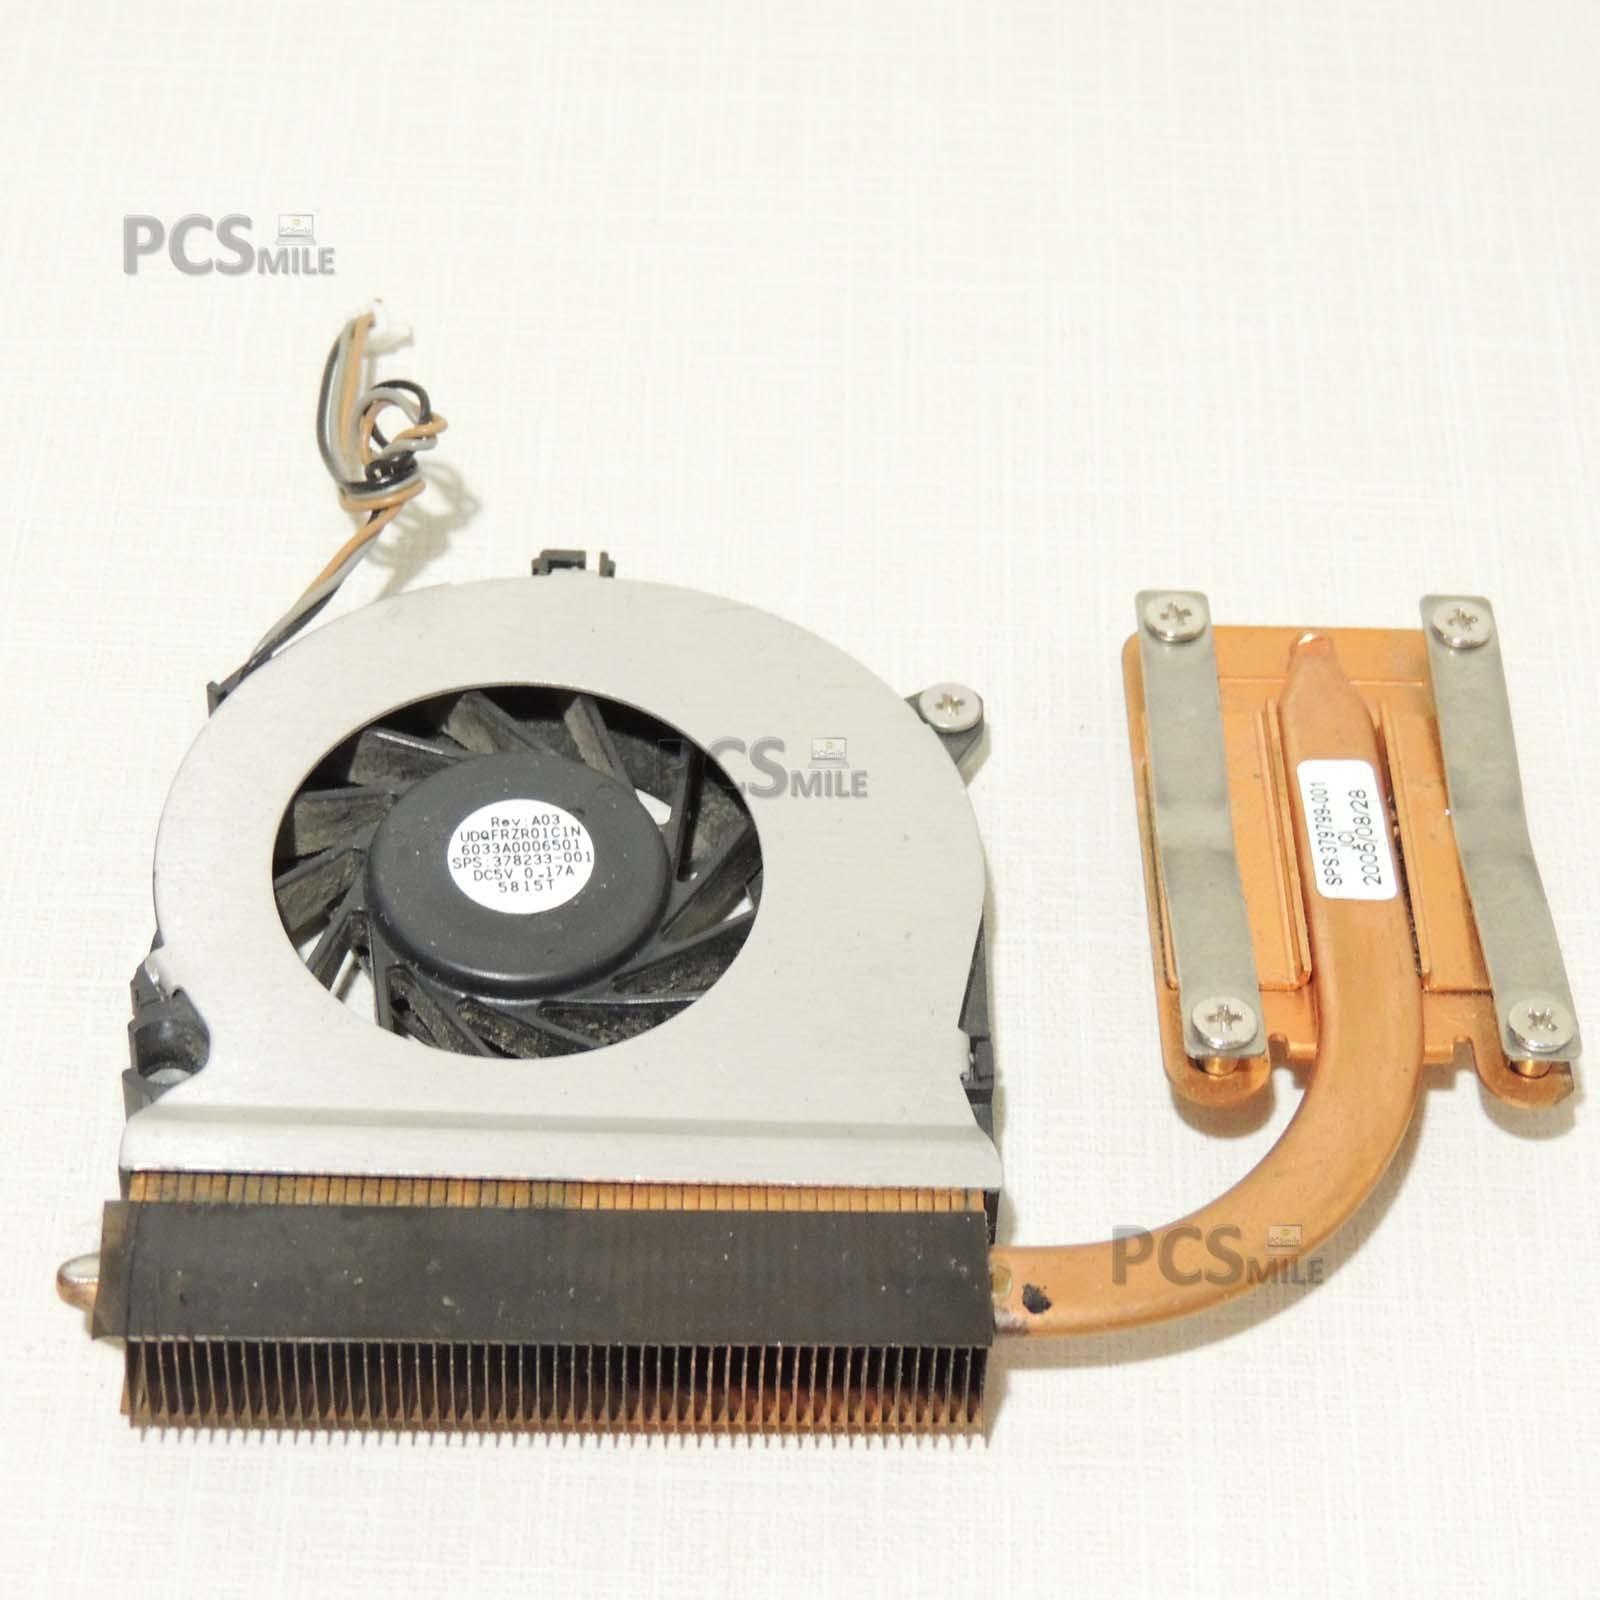 Ventola e dissipatore HP COMPAQ NC6120 379799-001 UDQFRZR01C1N